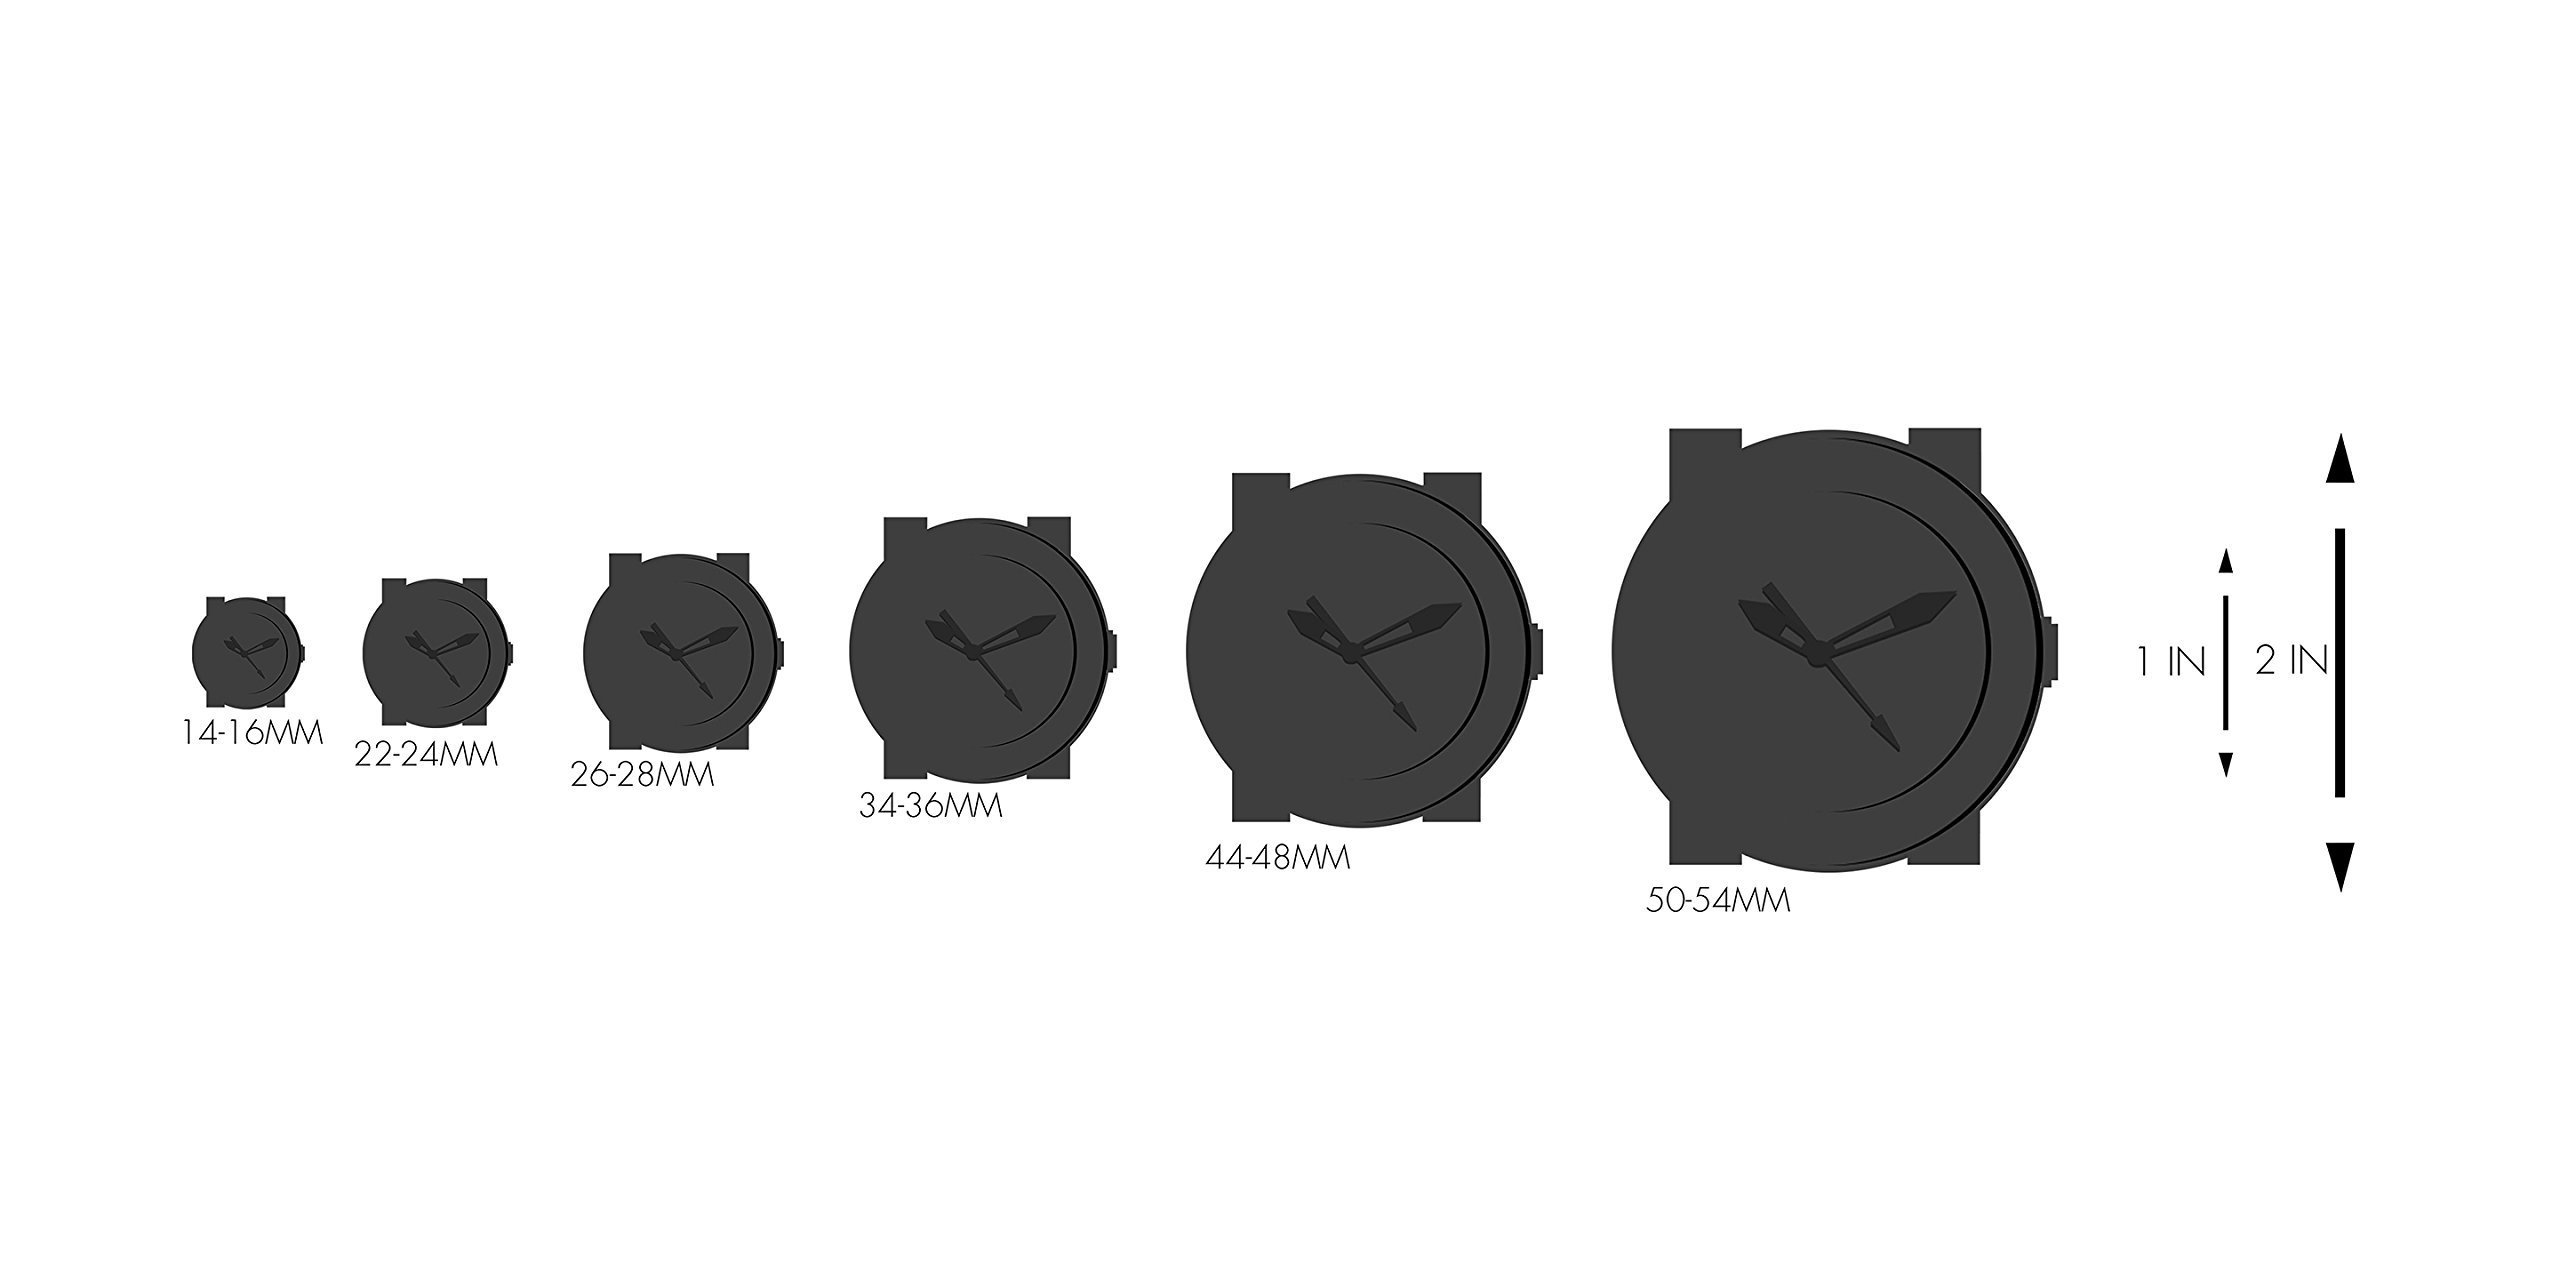 Timex Men's TW5M10400 Ironman Sleek 30 Black Resin Strap Watch by Timex (Image #6)